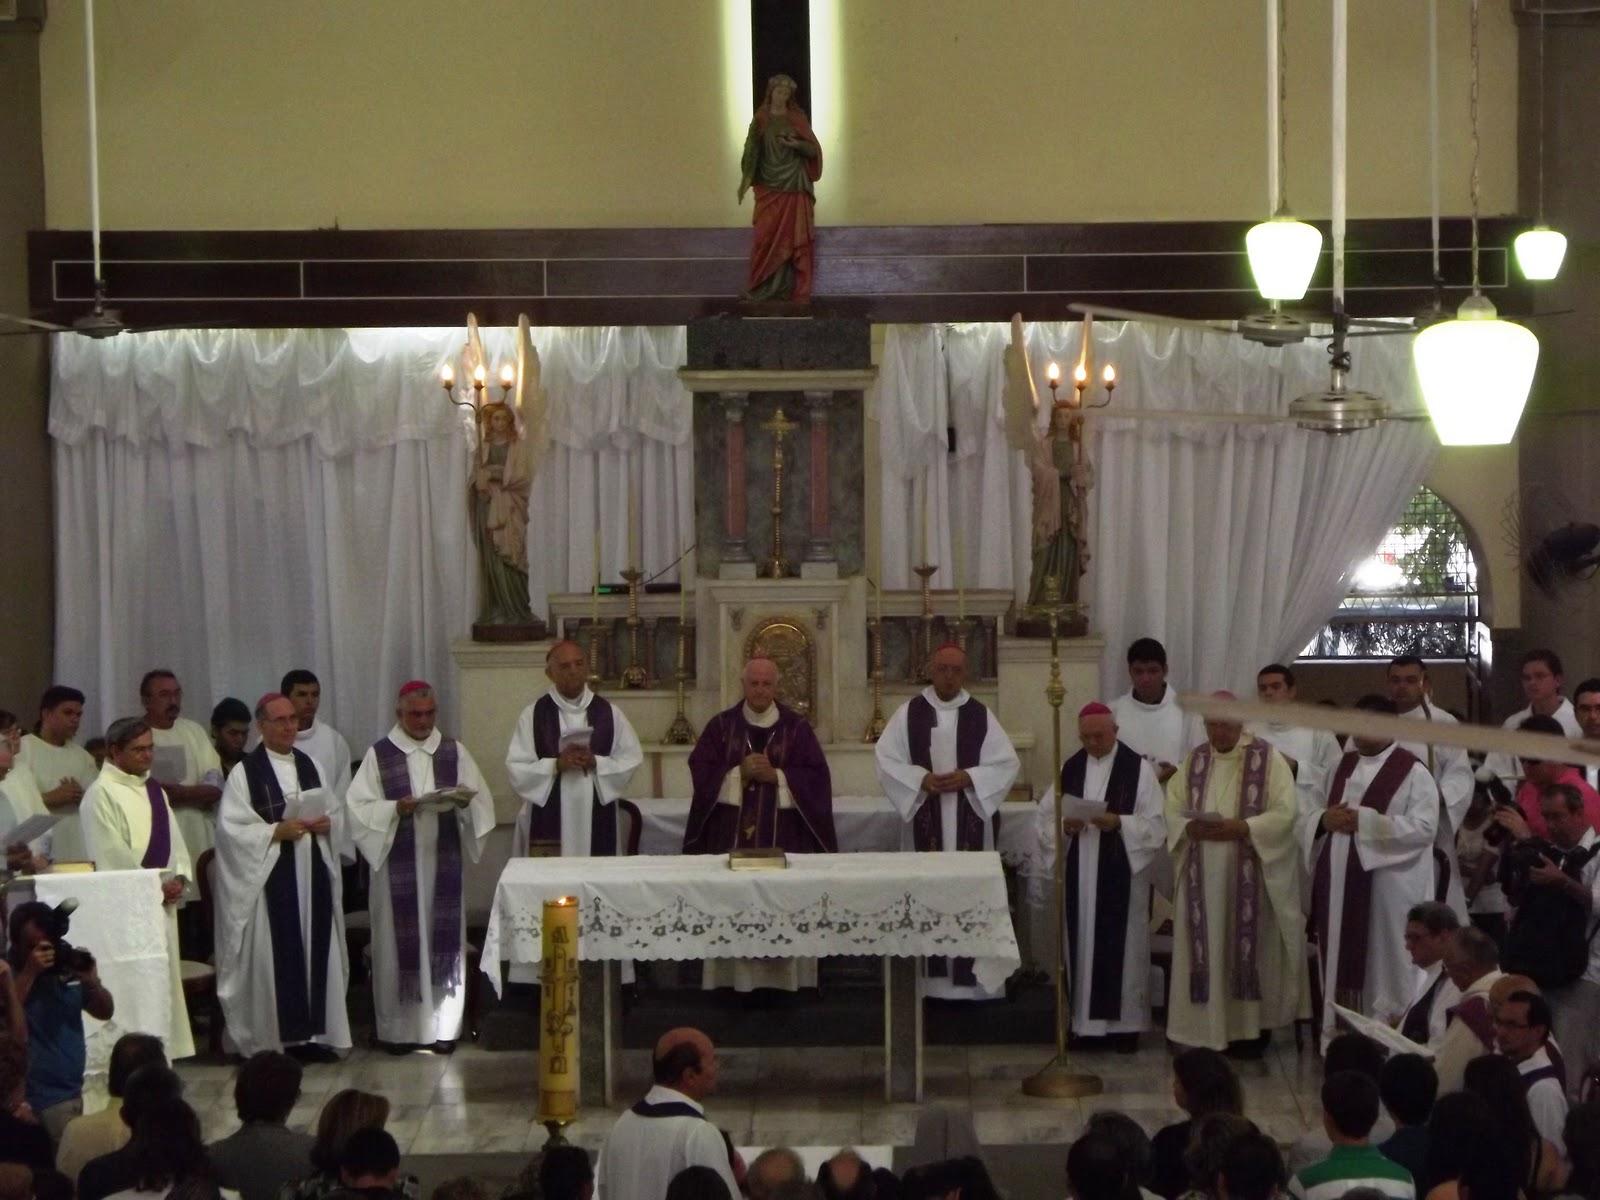 ... das exéquias foi presidida por D. Mariano Manzana, Bispo de Mossoró